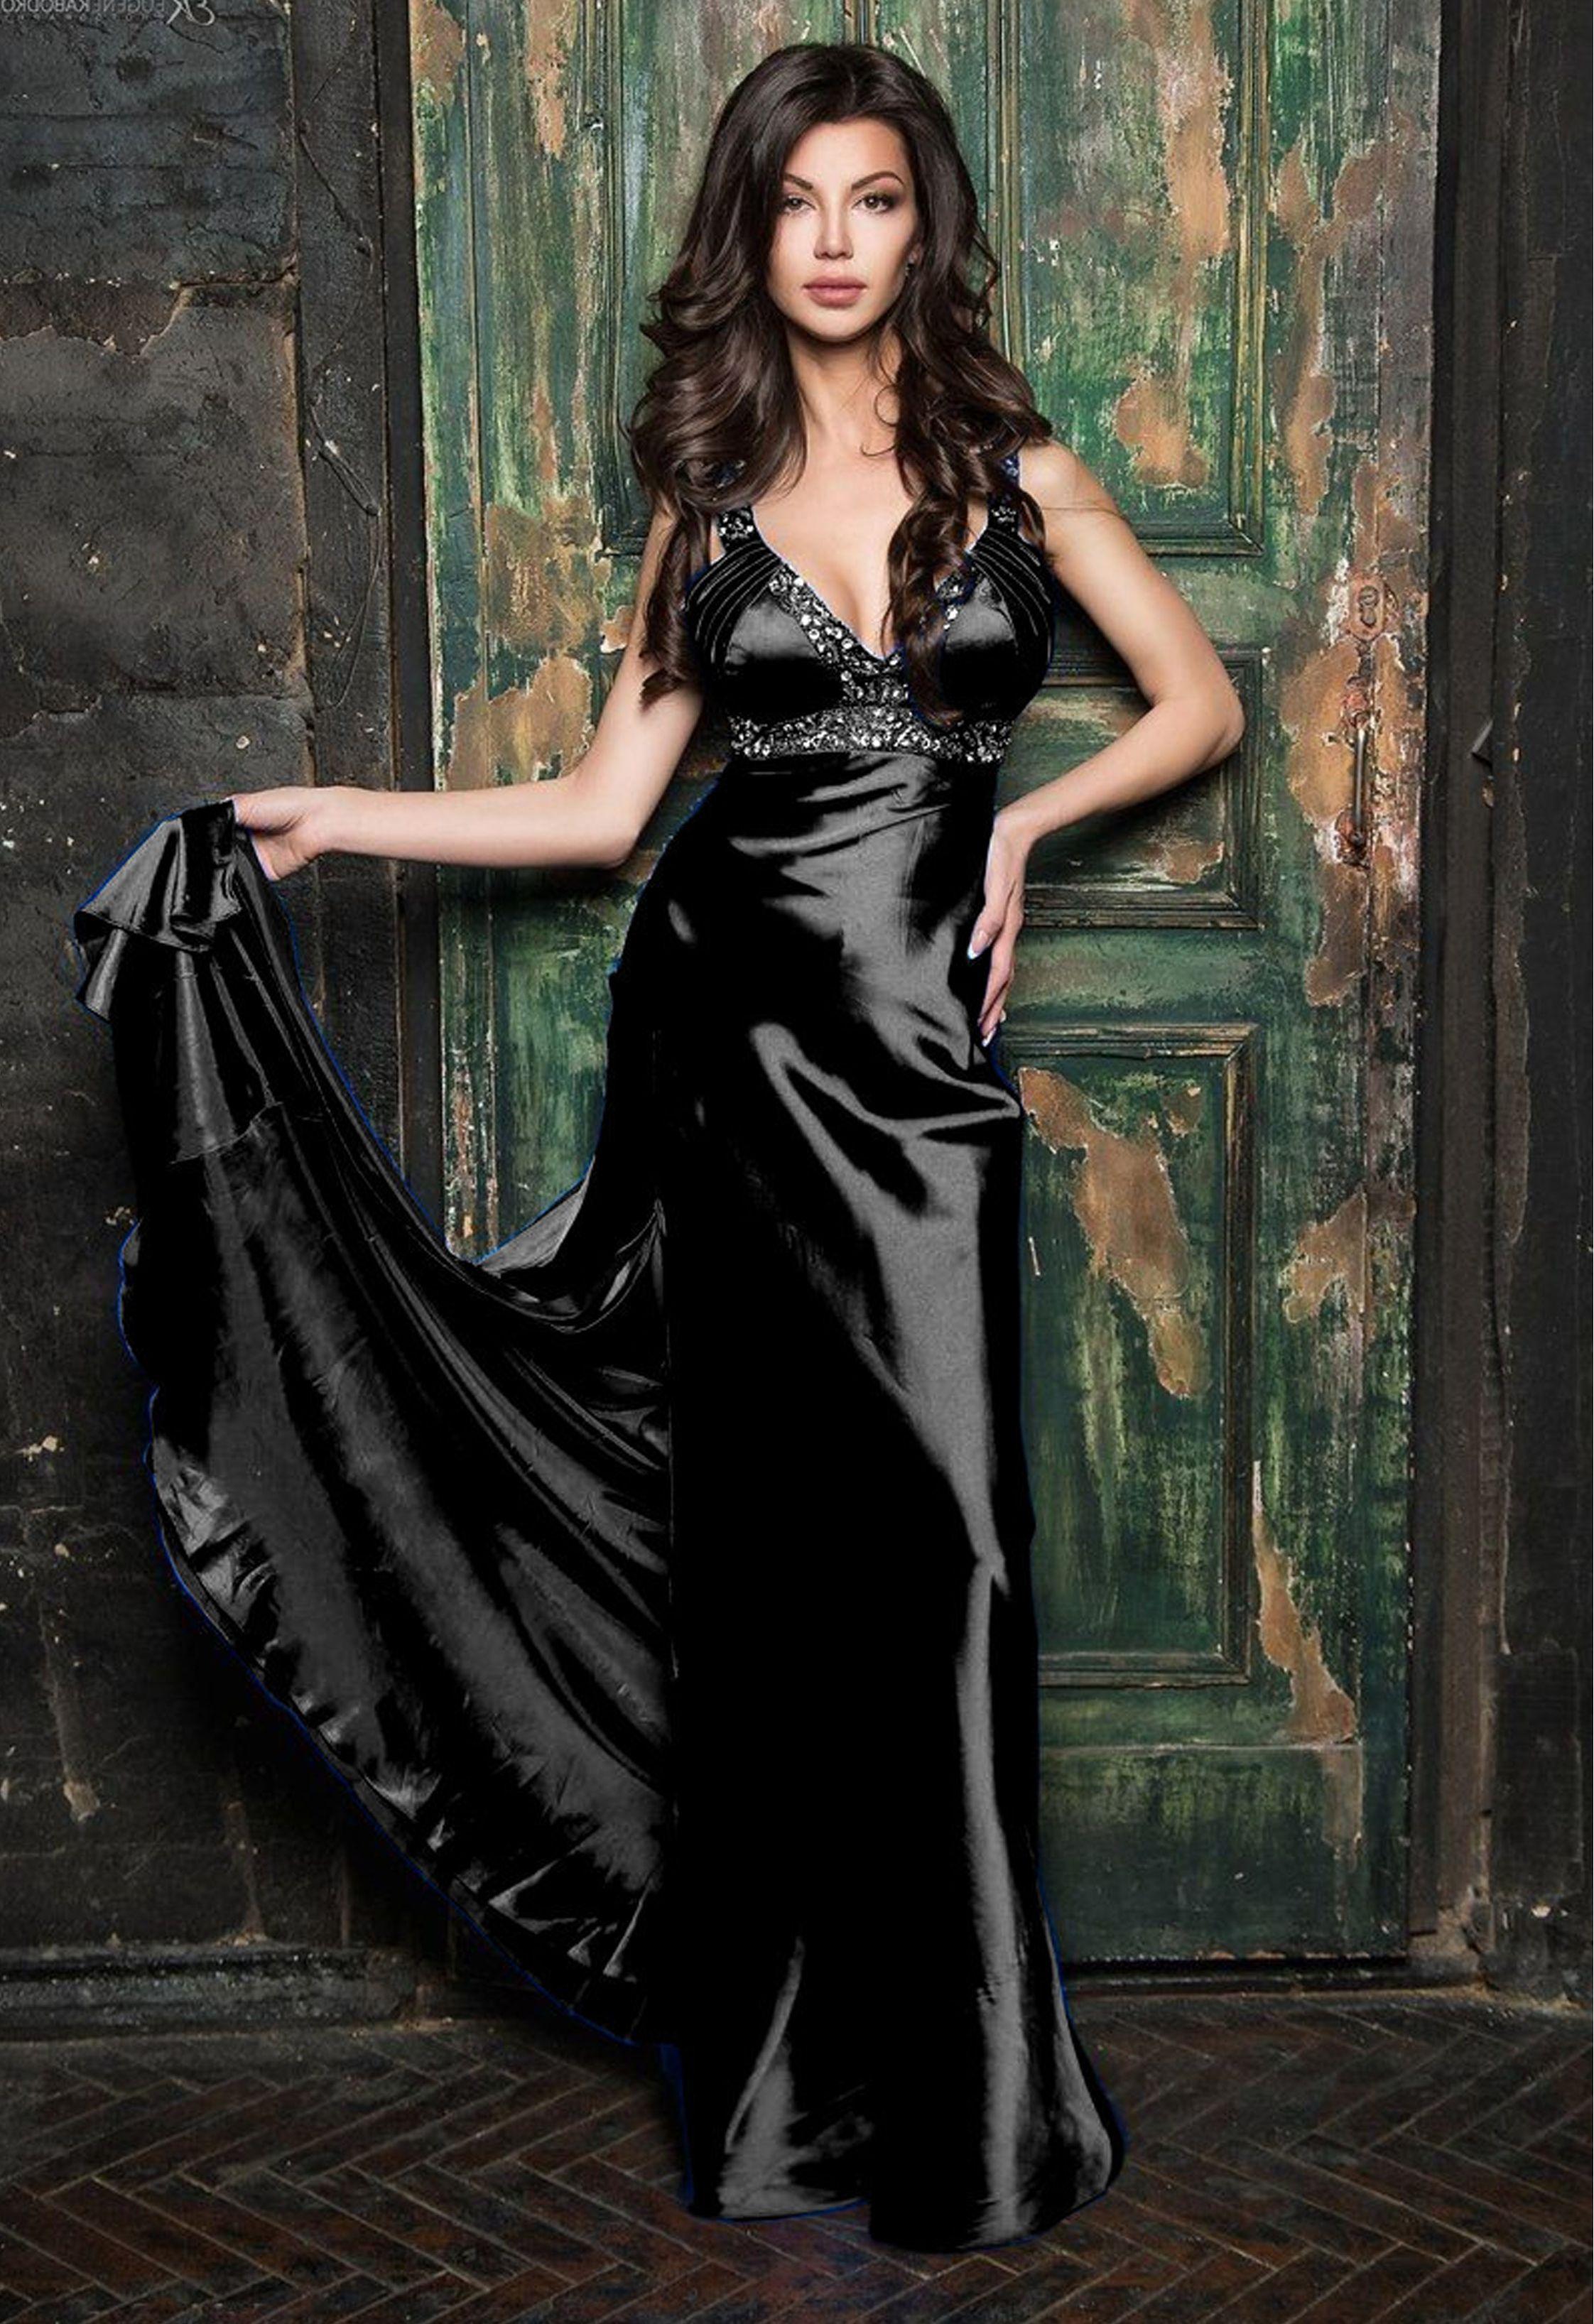 Angela Hudson Nude pinselkie bryant on silk satin | black satin dress